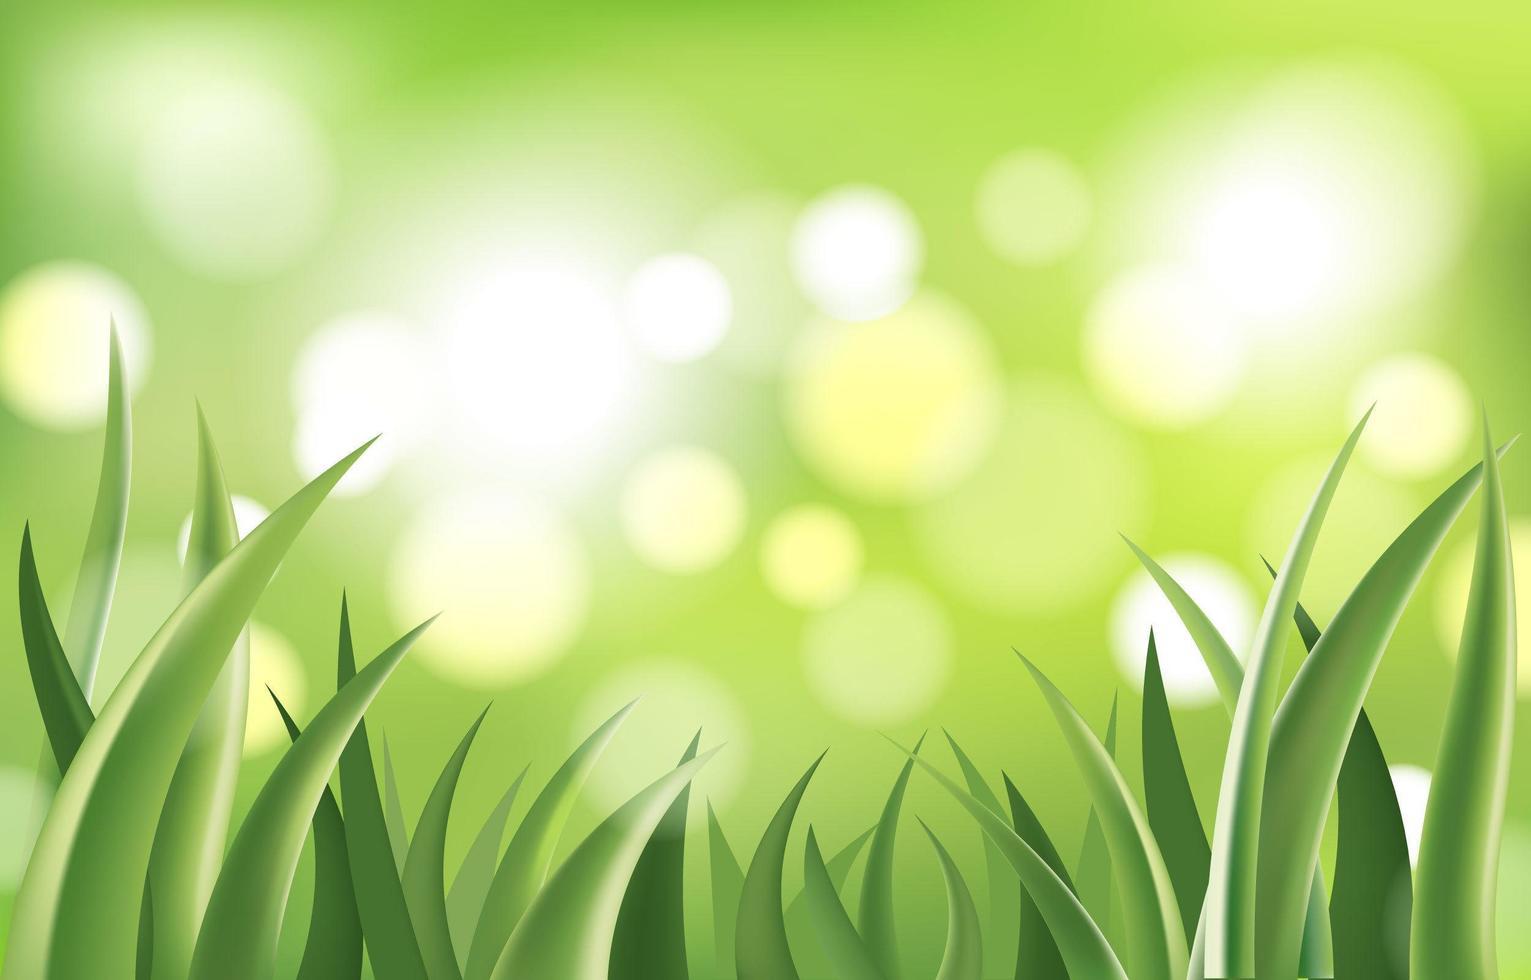 abstrakt grönt gräs i bokehbakgrund vektor